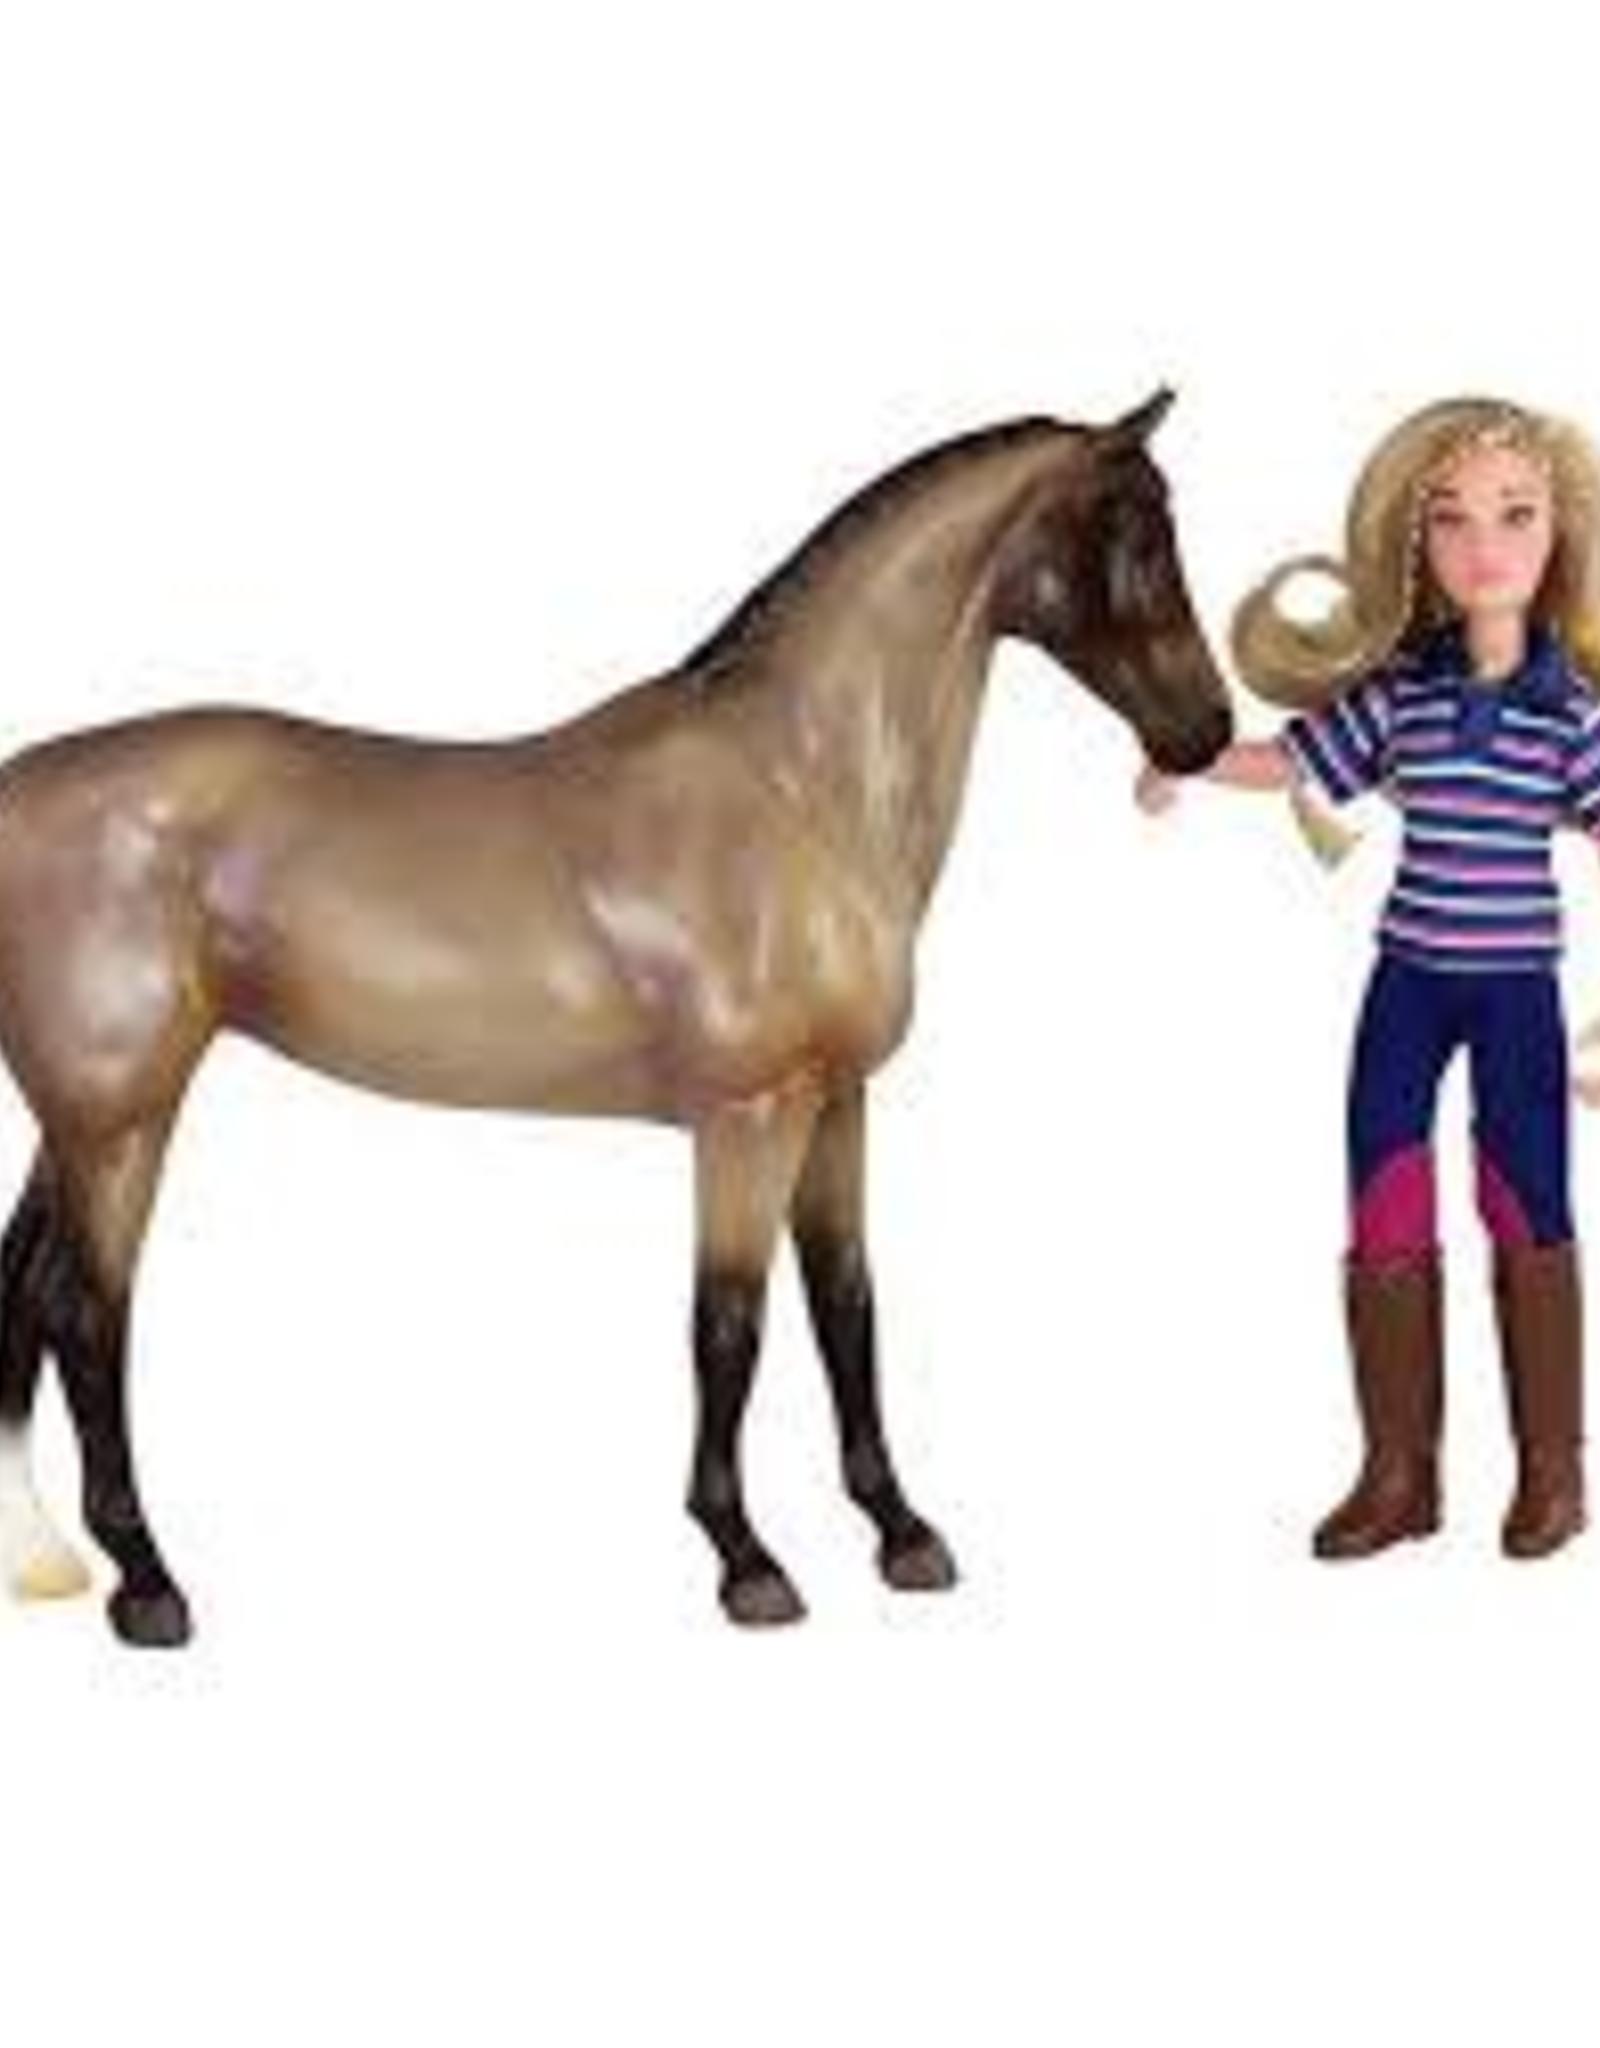 Classics English horse and rider